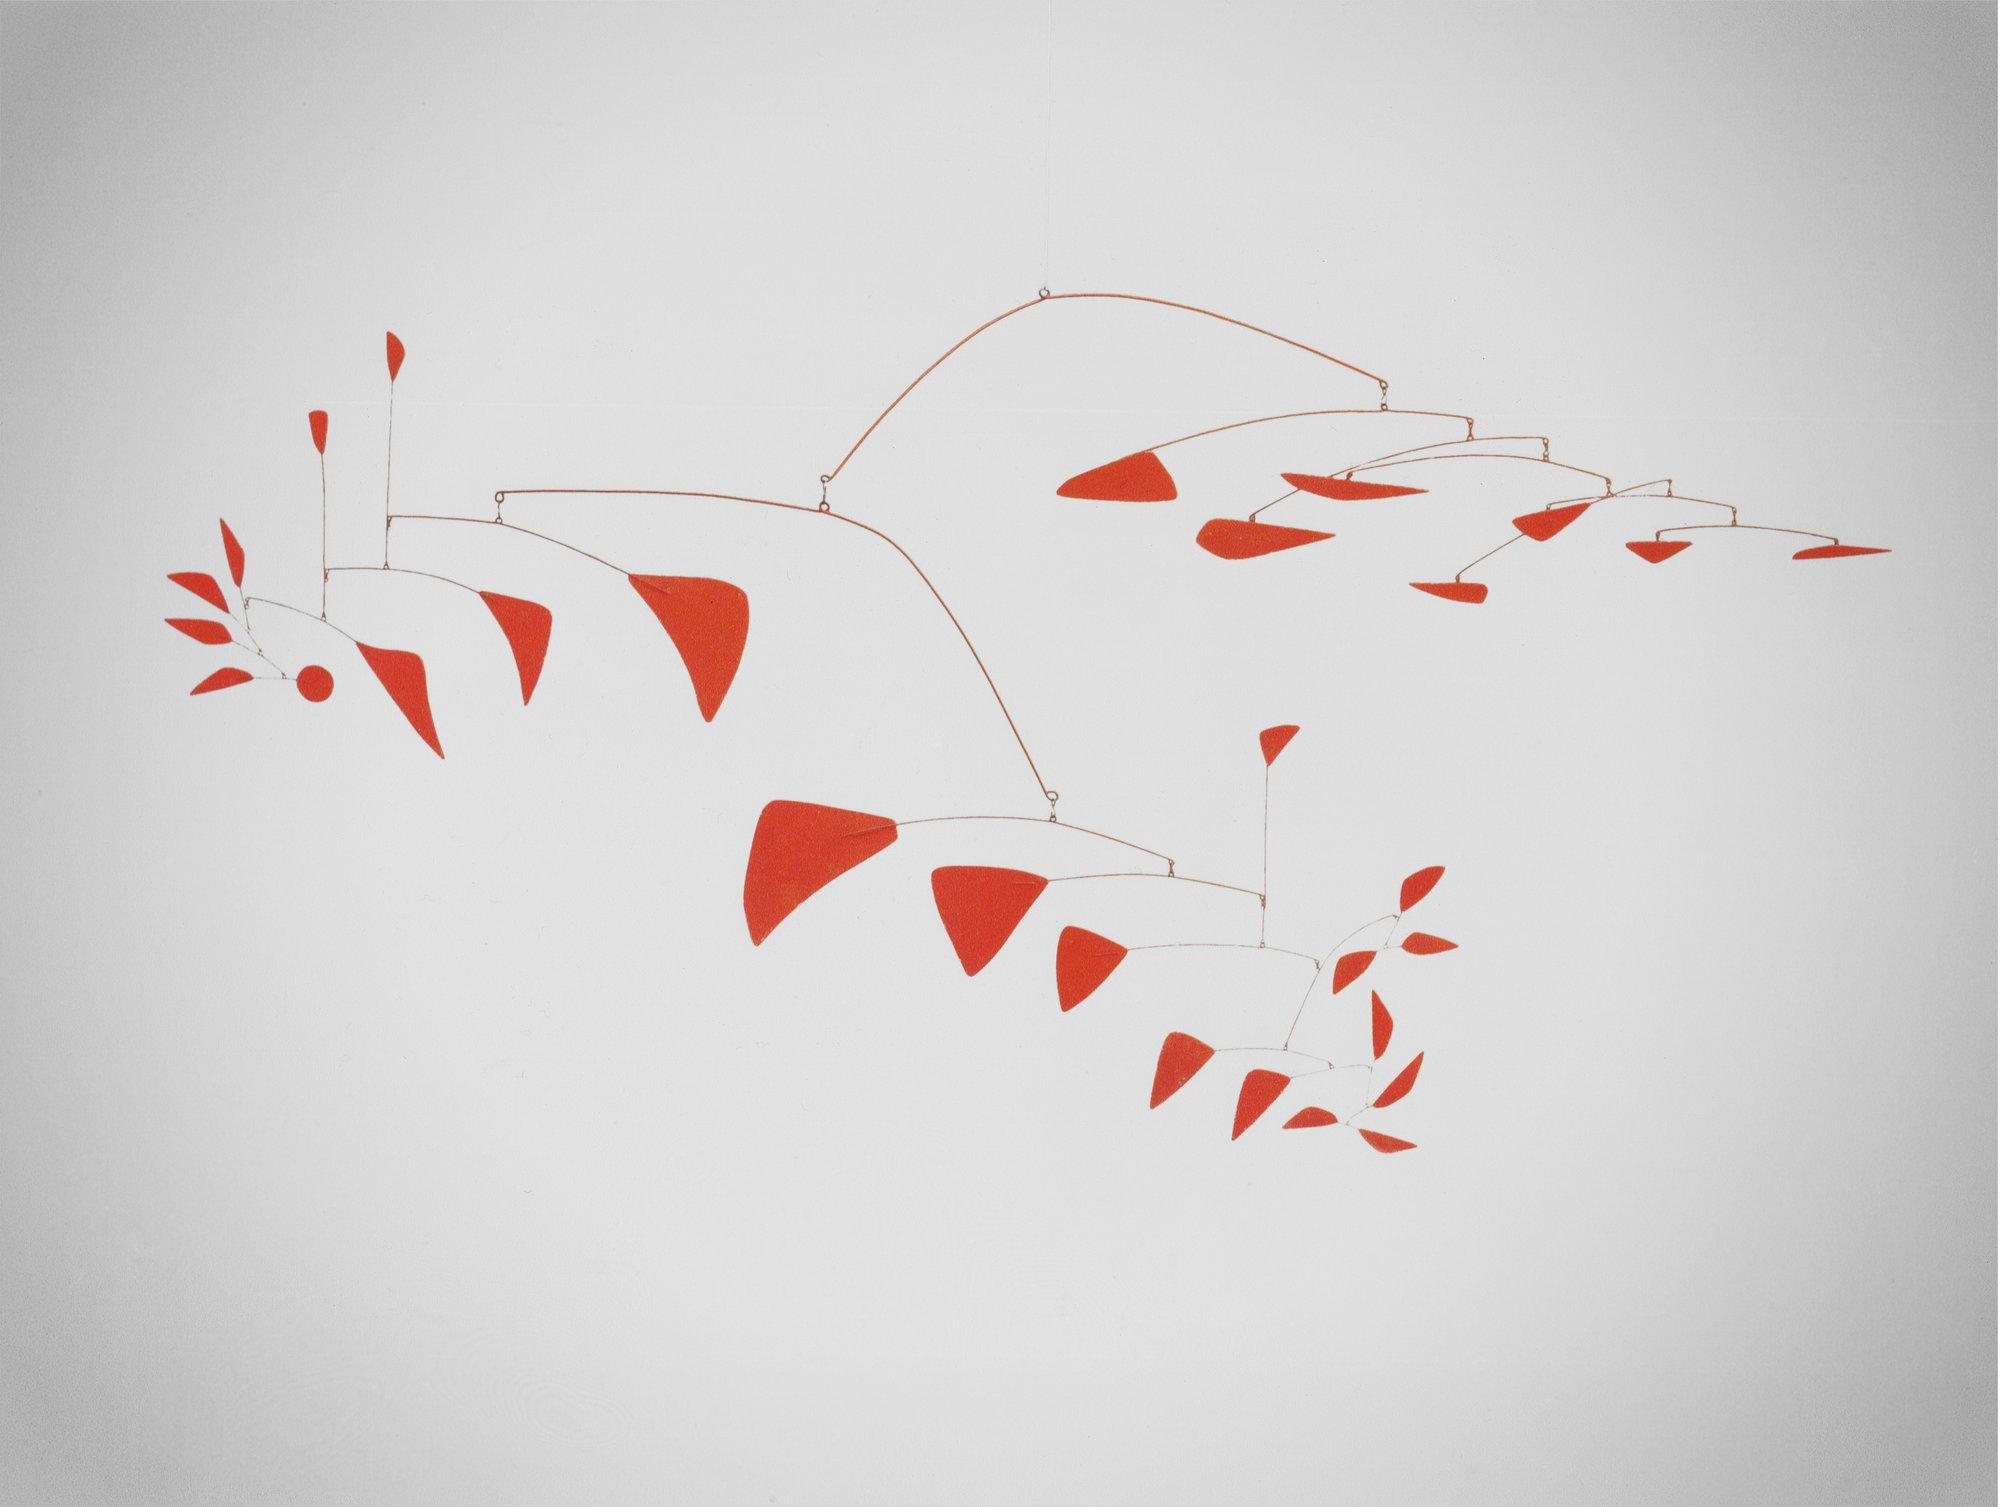 Alexander Calder | Pace Gallery